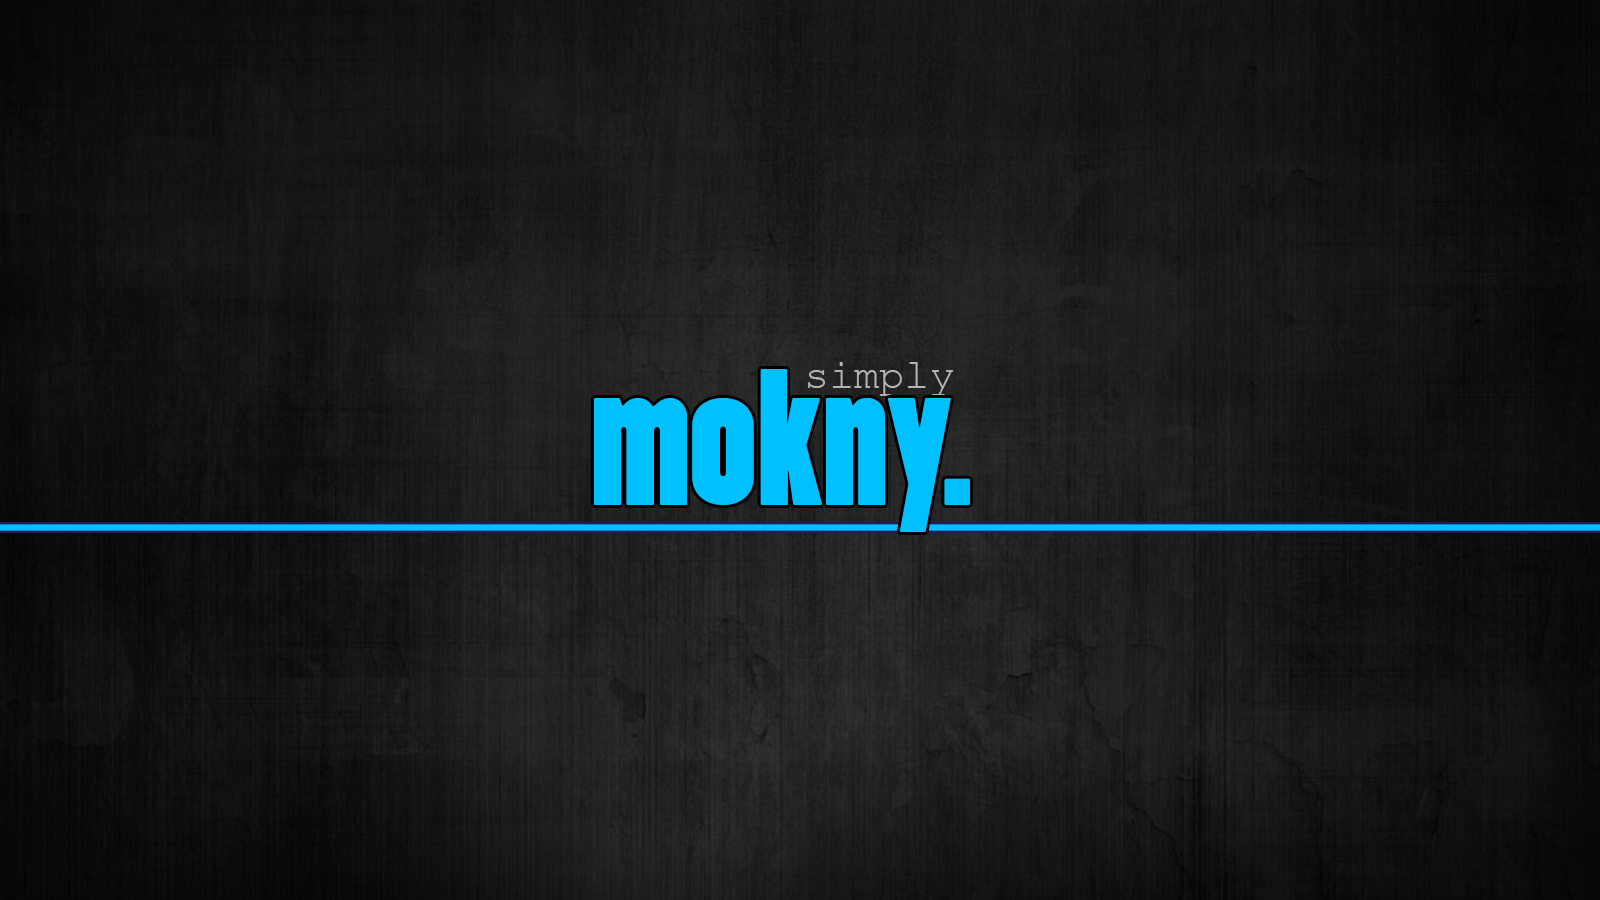 mokny - X-Plane Org Forum